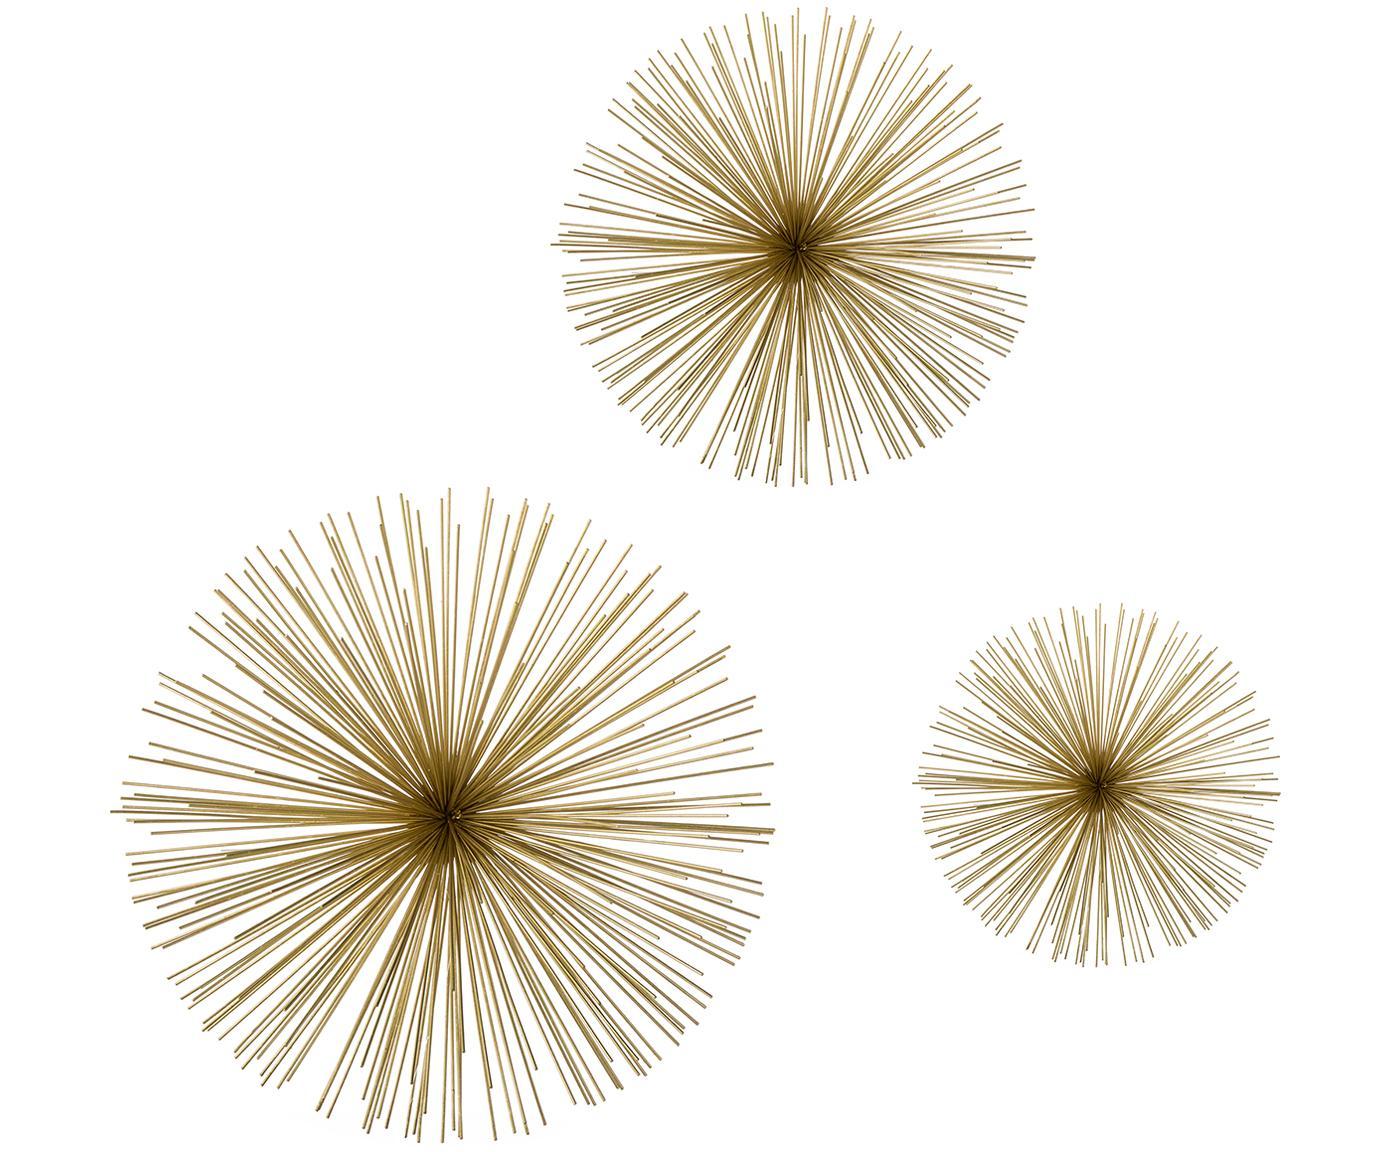 Wandobjekt-Set Ray aus Metall, 3-tlg., Metall, Goldfarben, Verschiedene Grössen